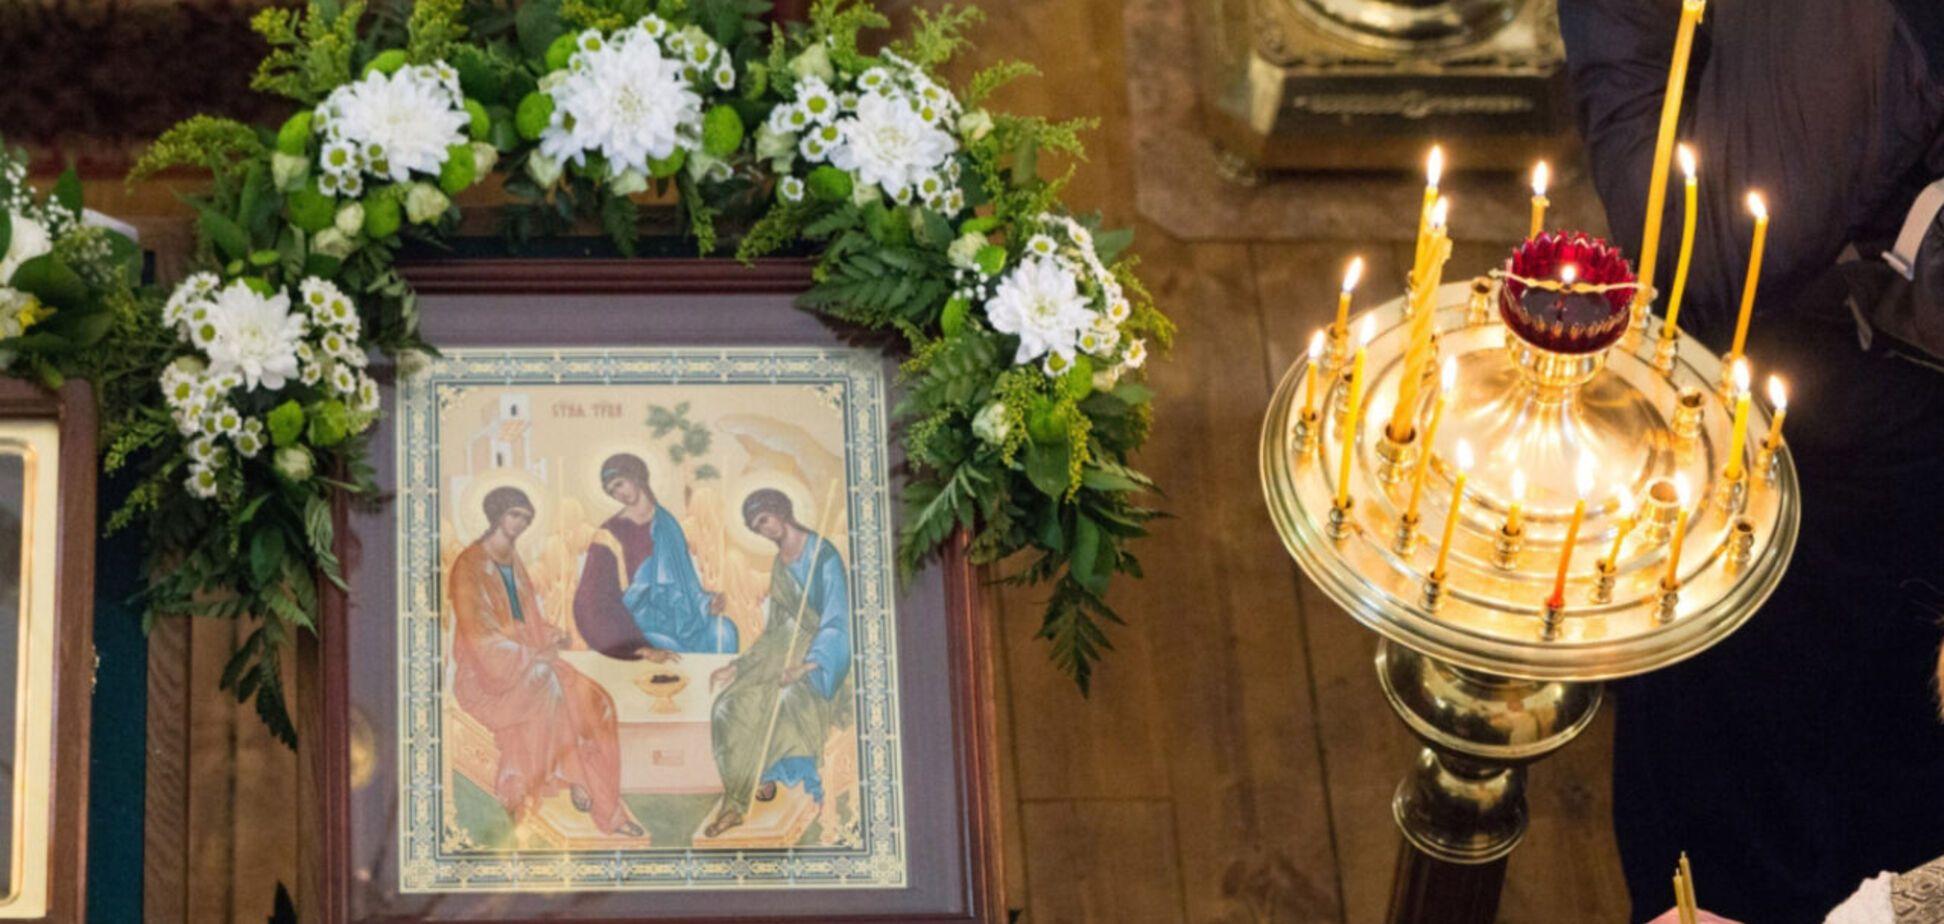 Молитва в Троїцьку поминальну суботу: як ушанувати пам'ять померлих